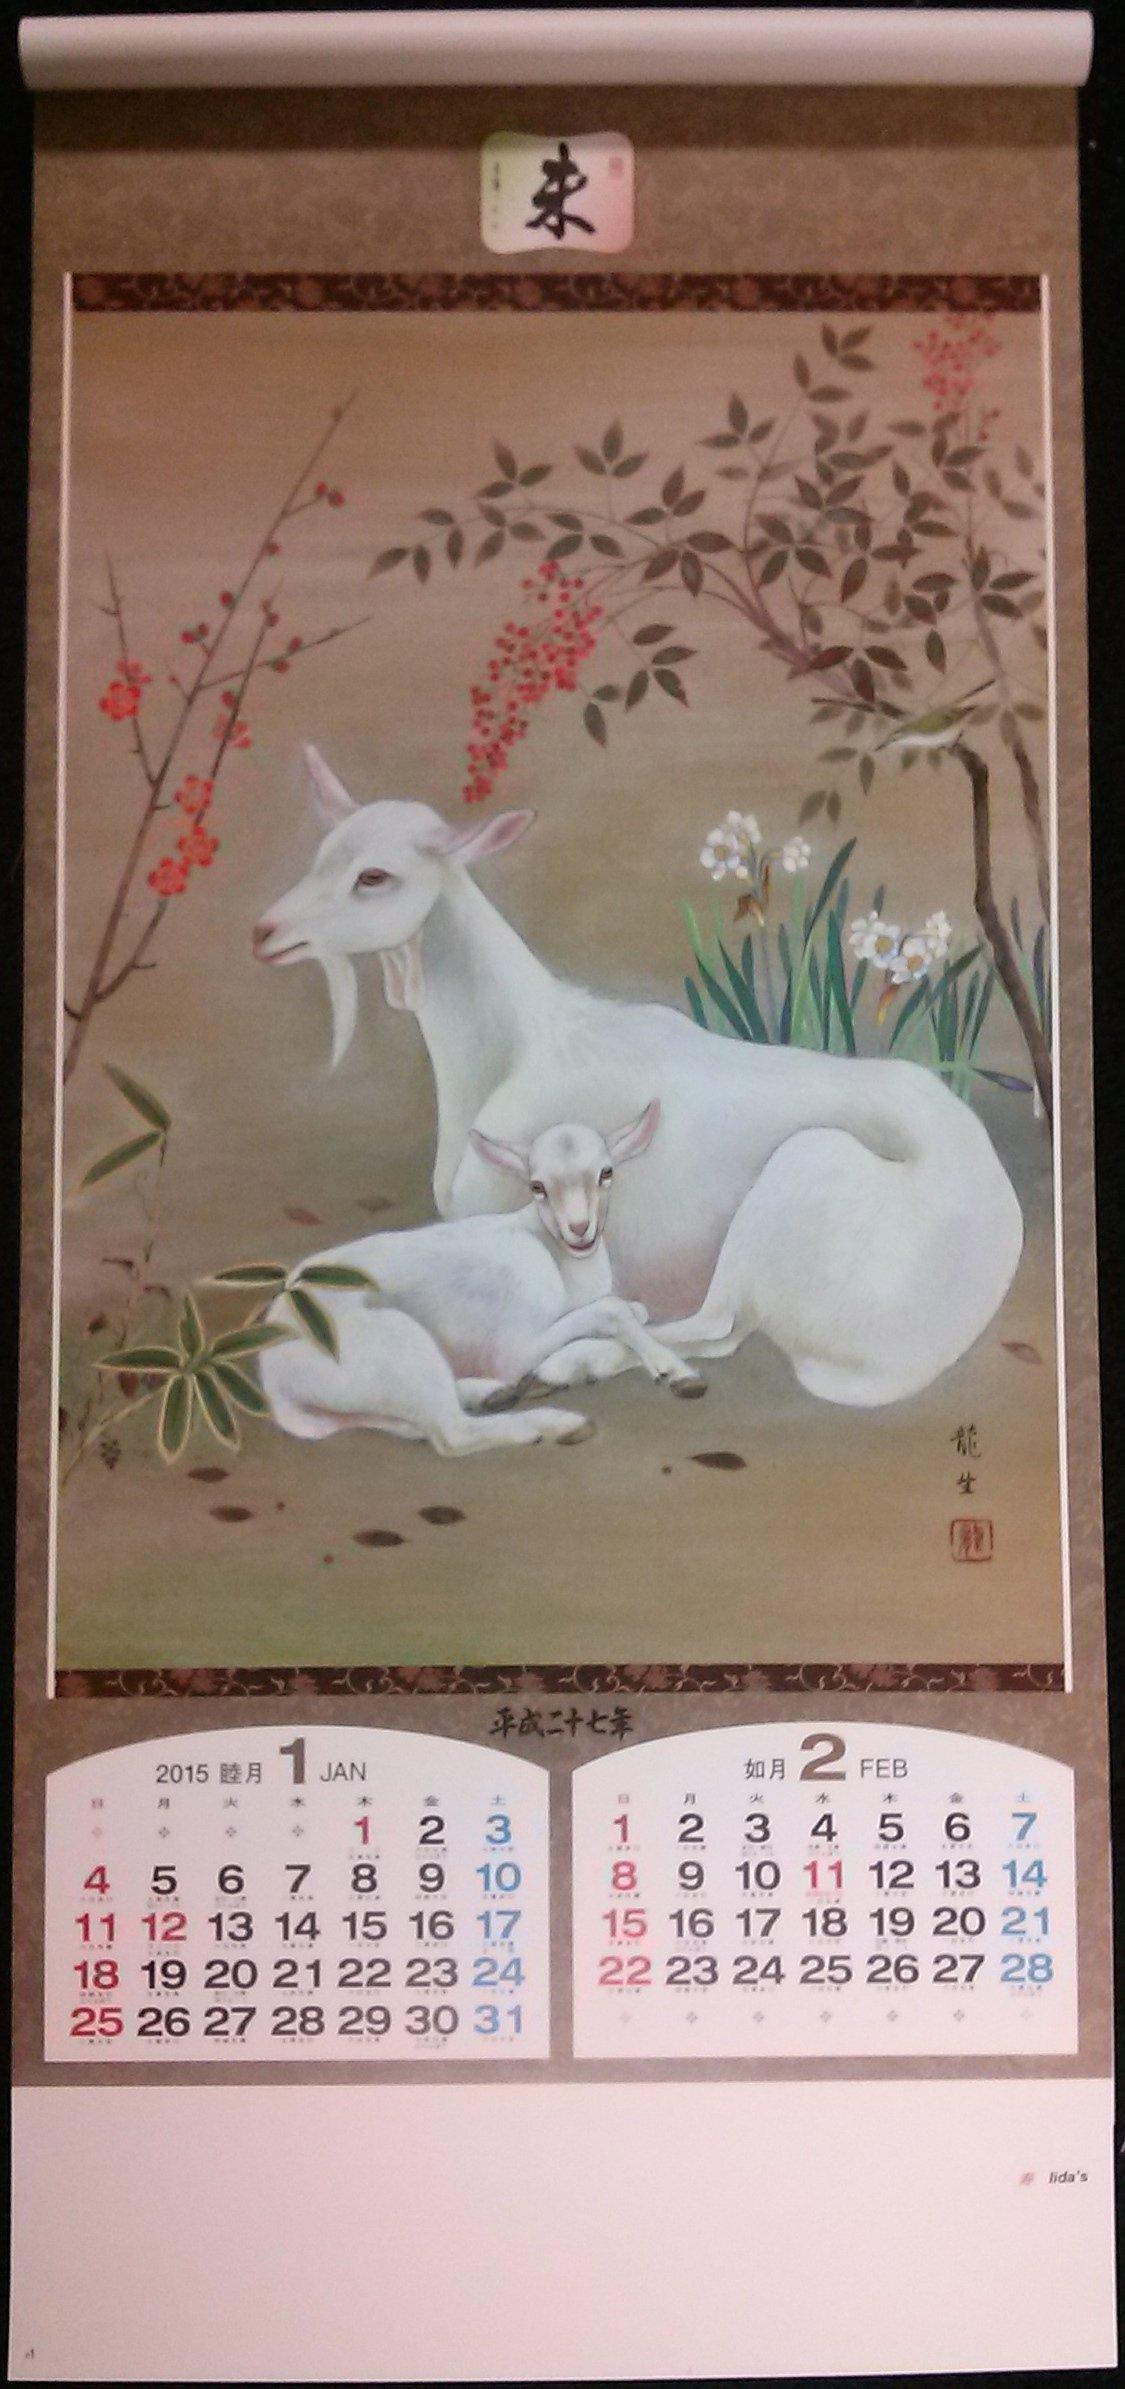 Year of the sheep 2015 calendar from Japan in Honolulu, HI